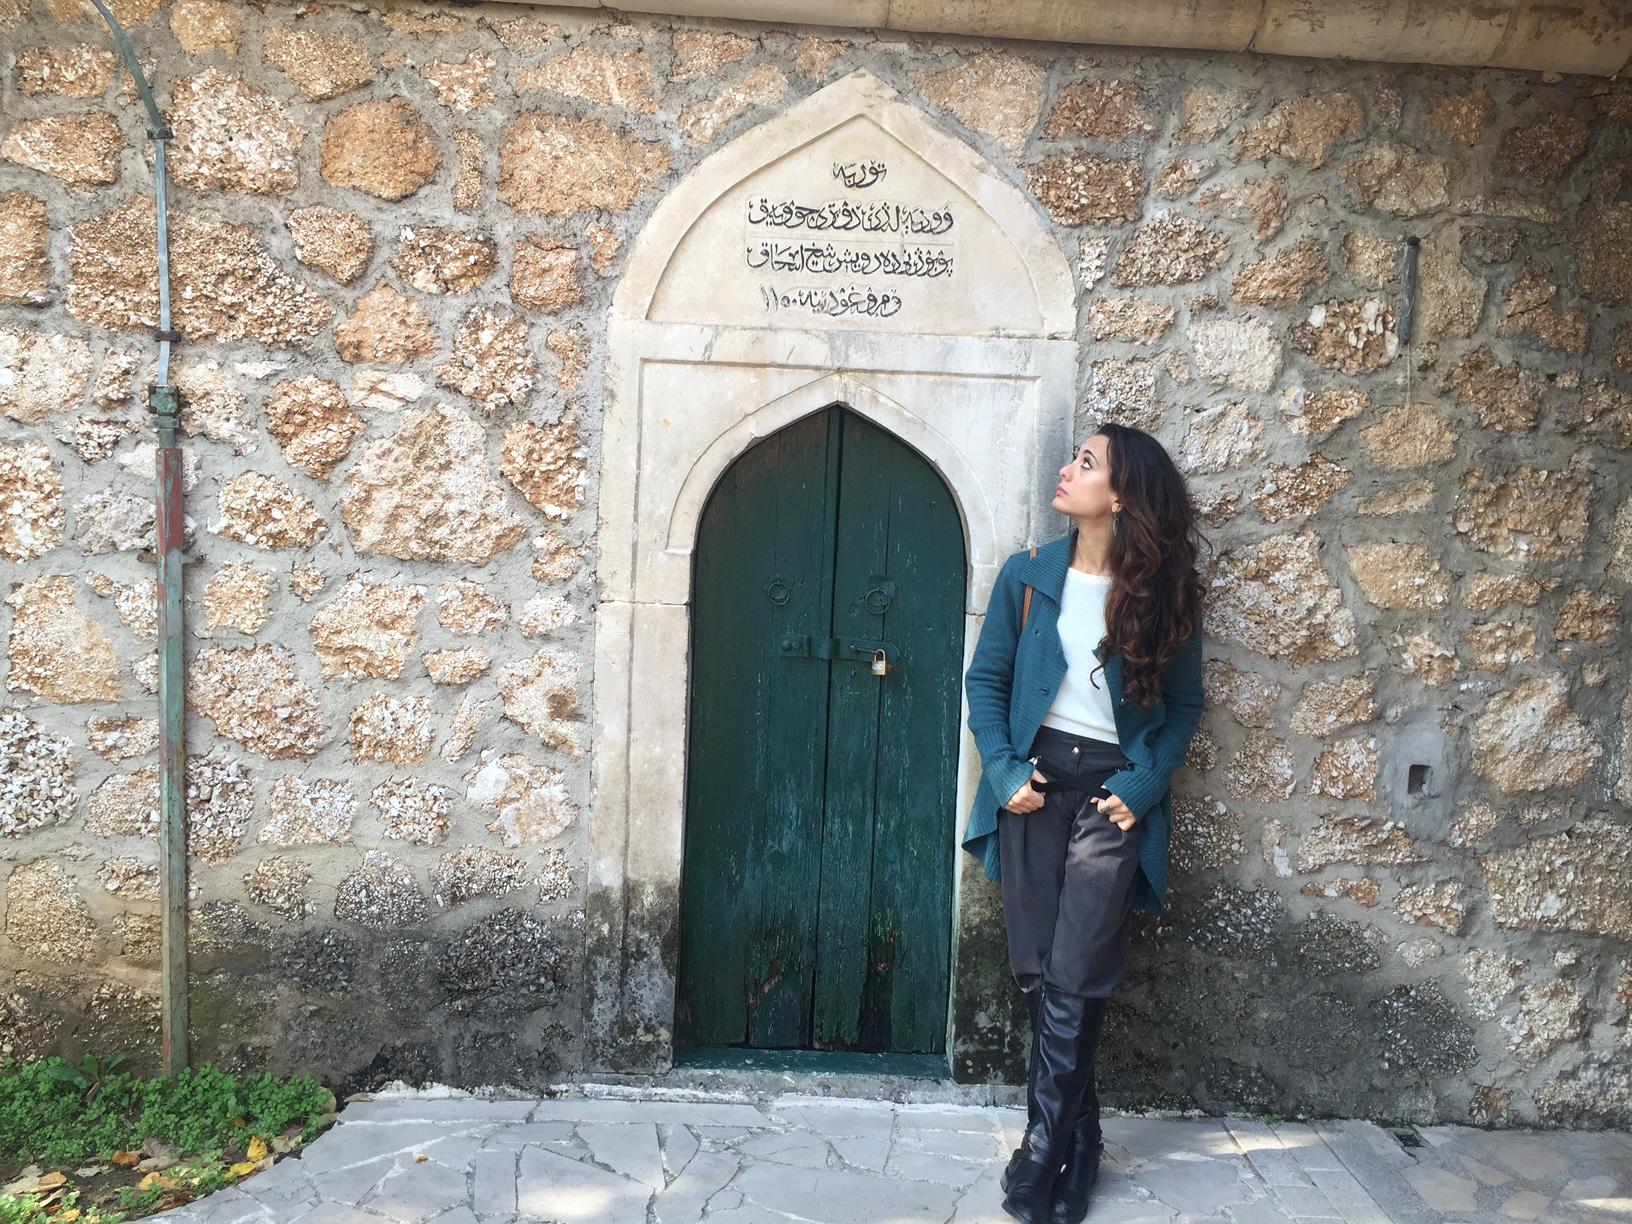 Quick tips if you visit Mostar, Bosnia